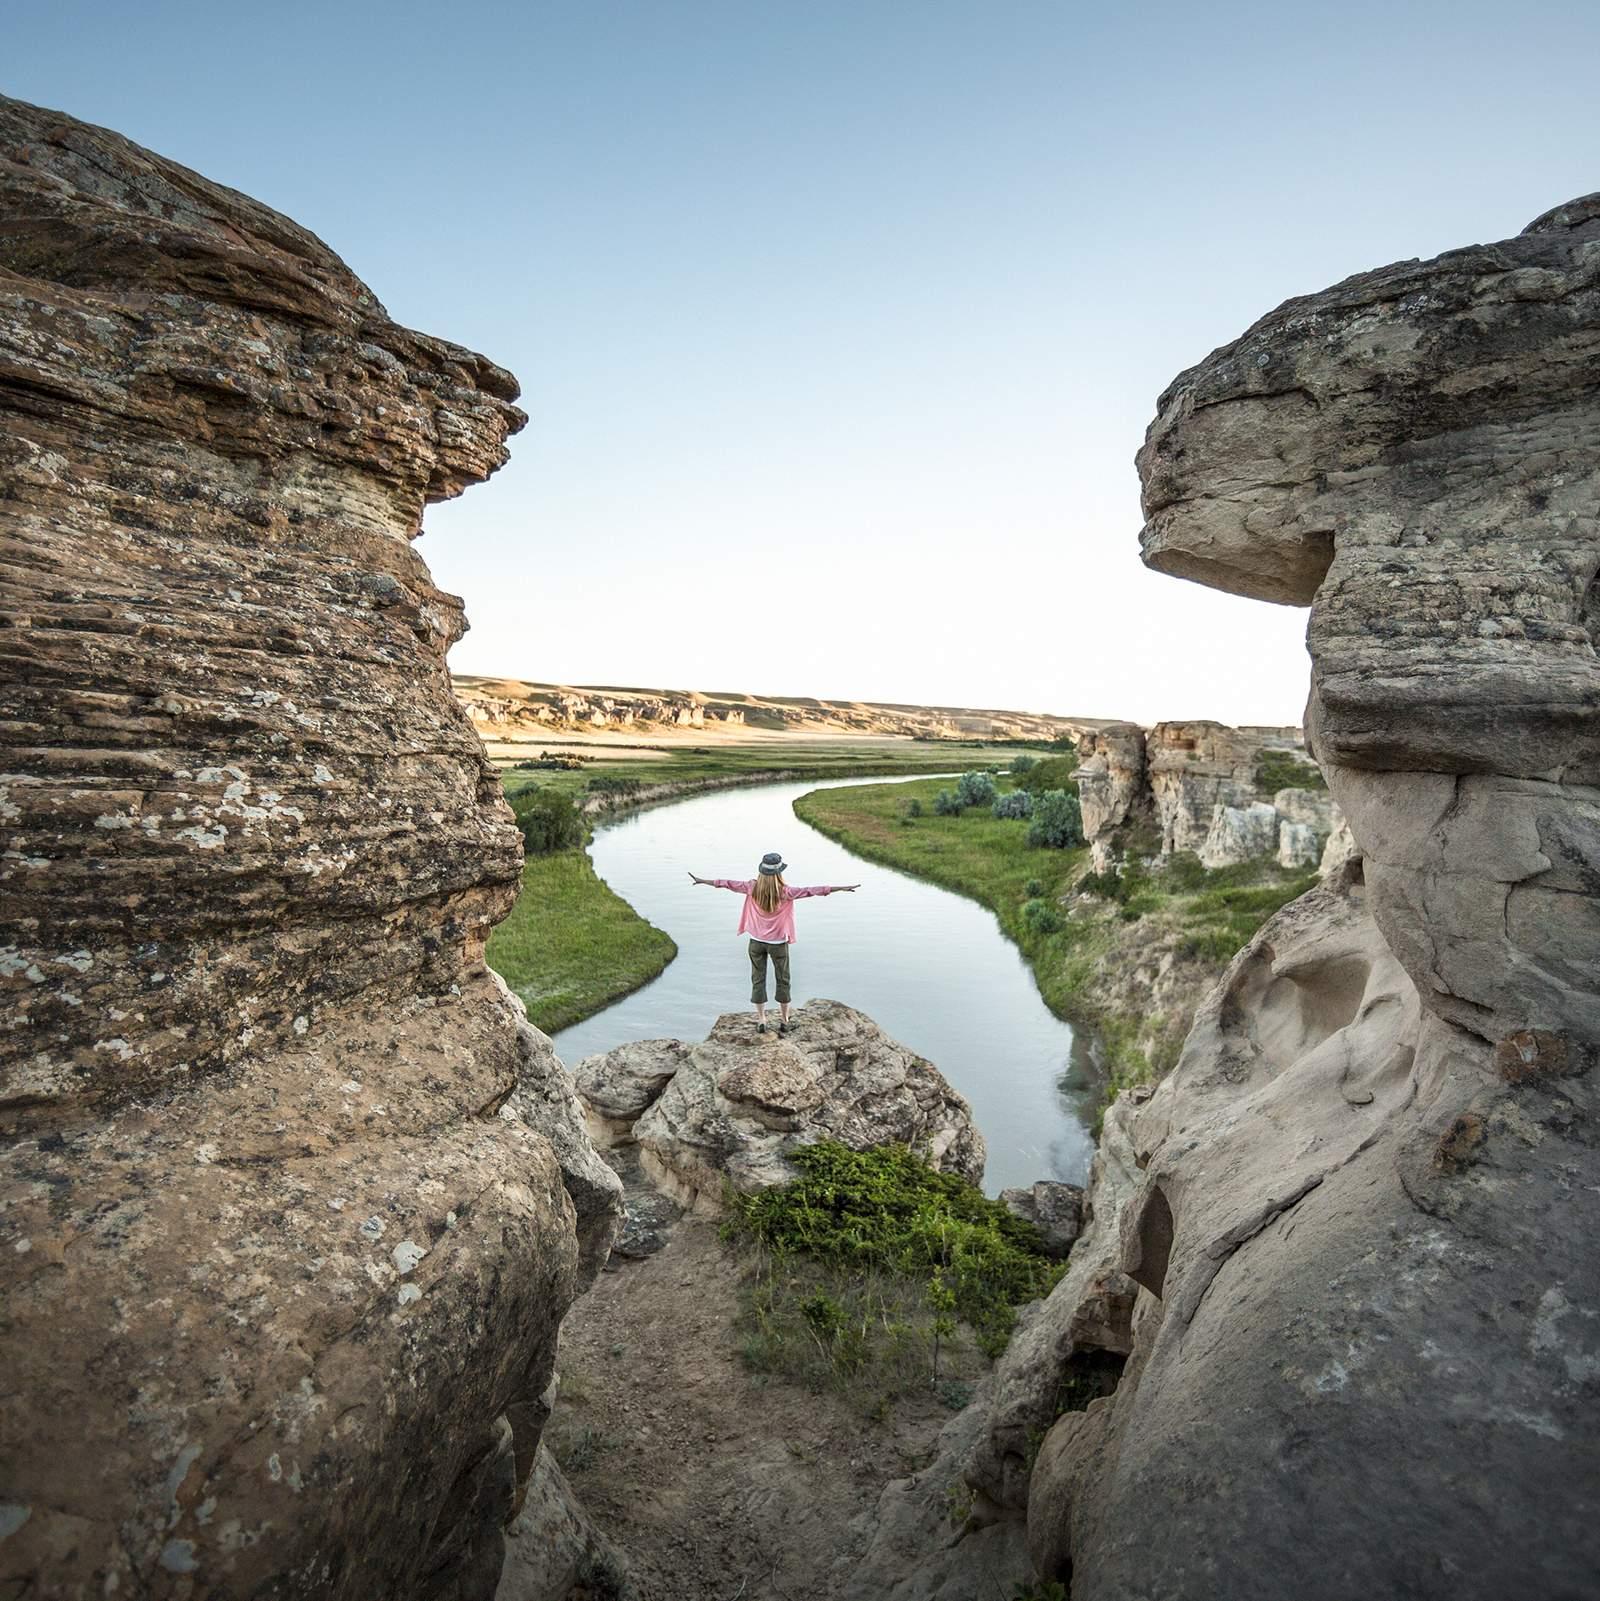 Landschaftsaussicht des Writing-on-Stone Provincial Parks